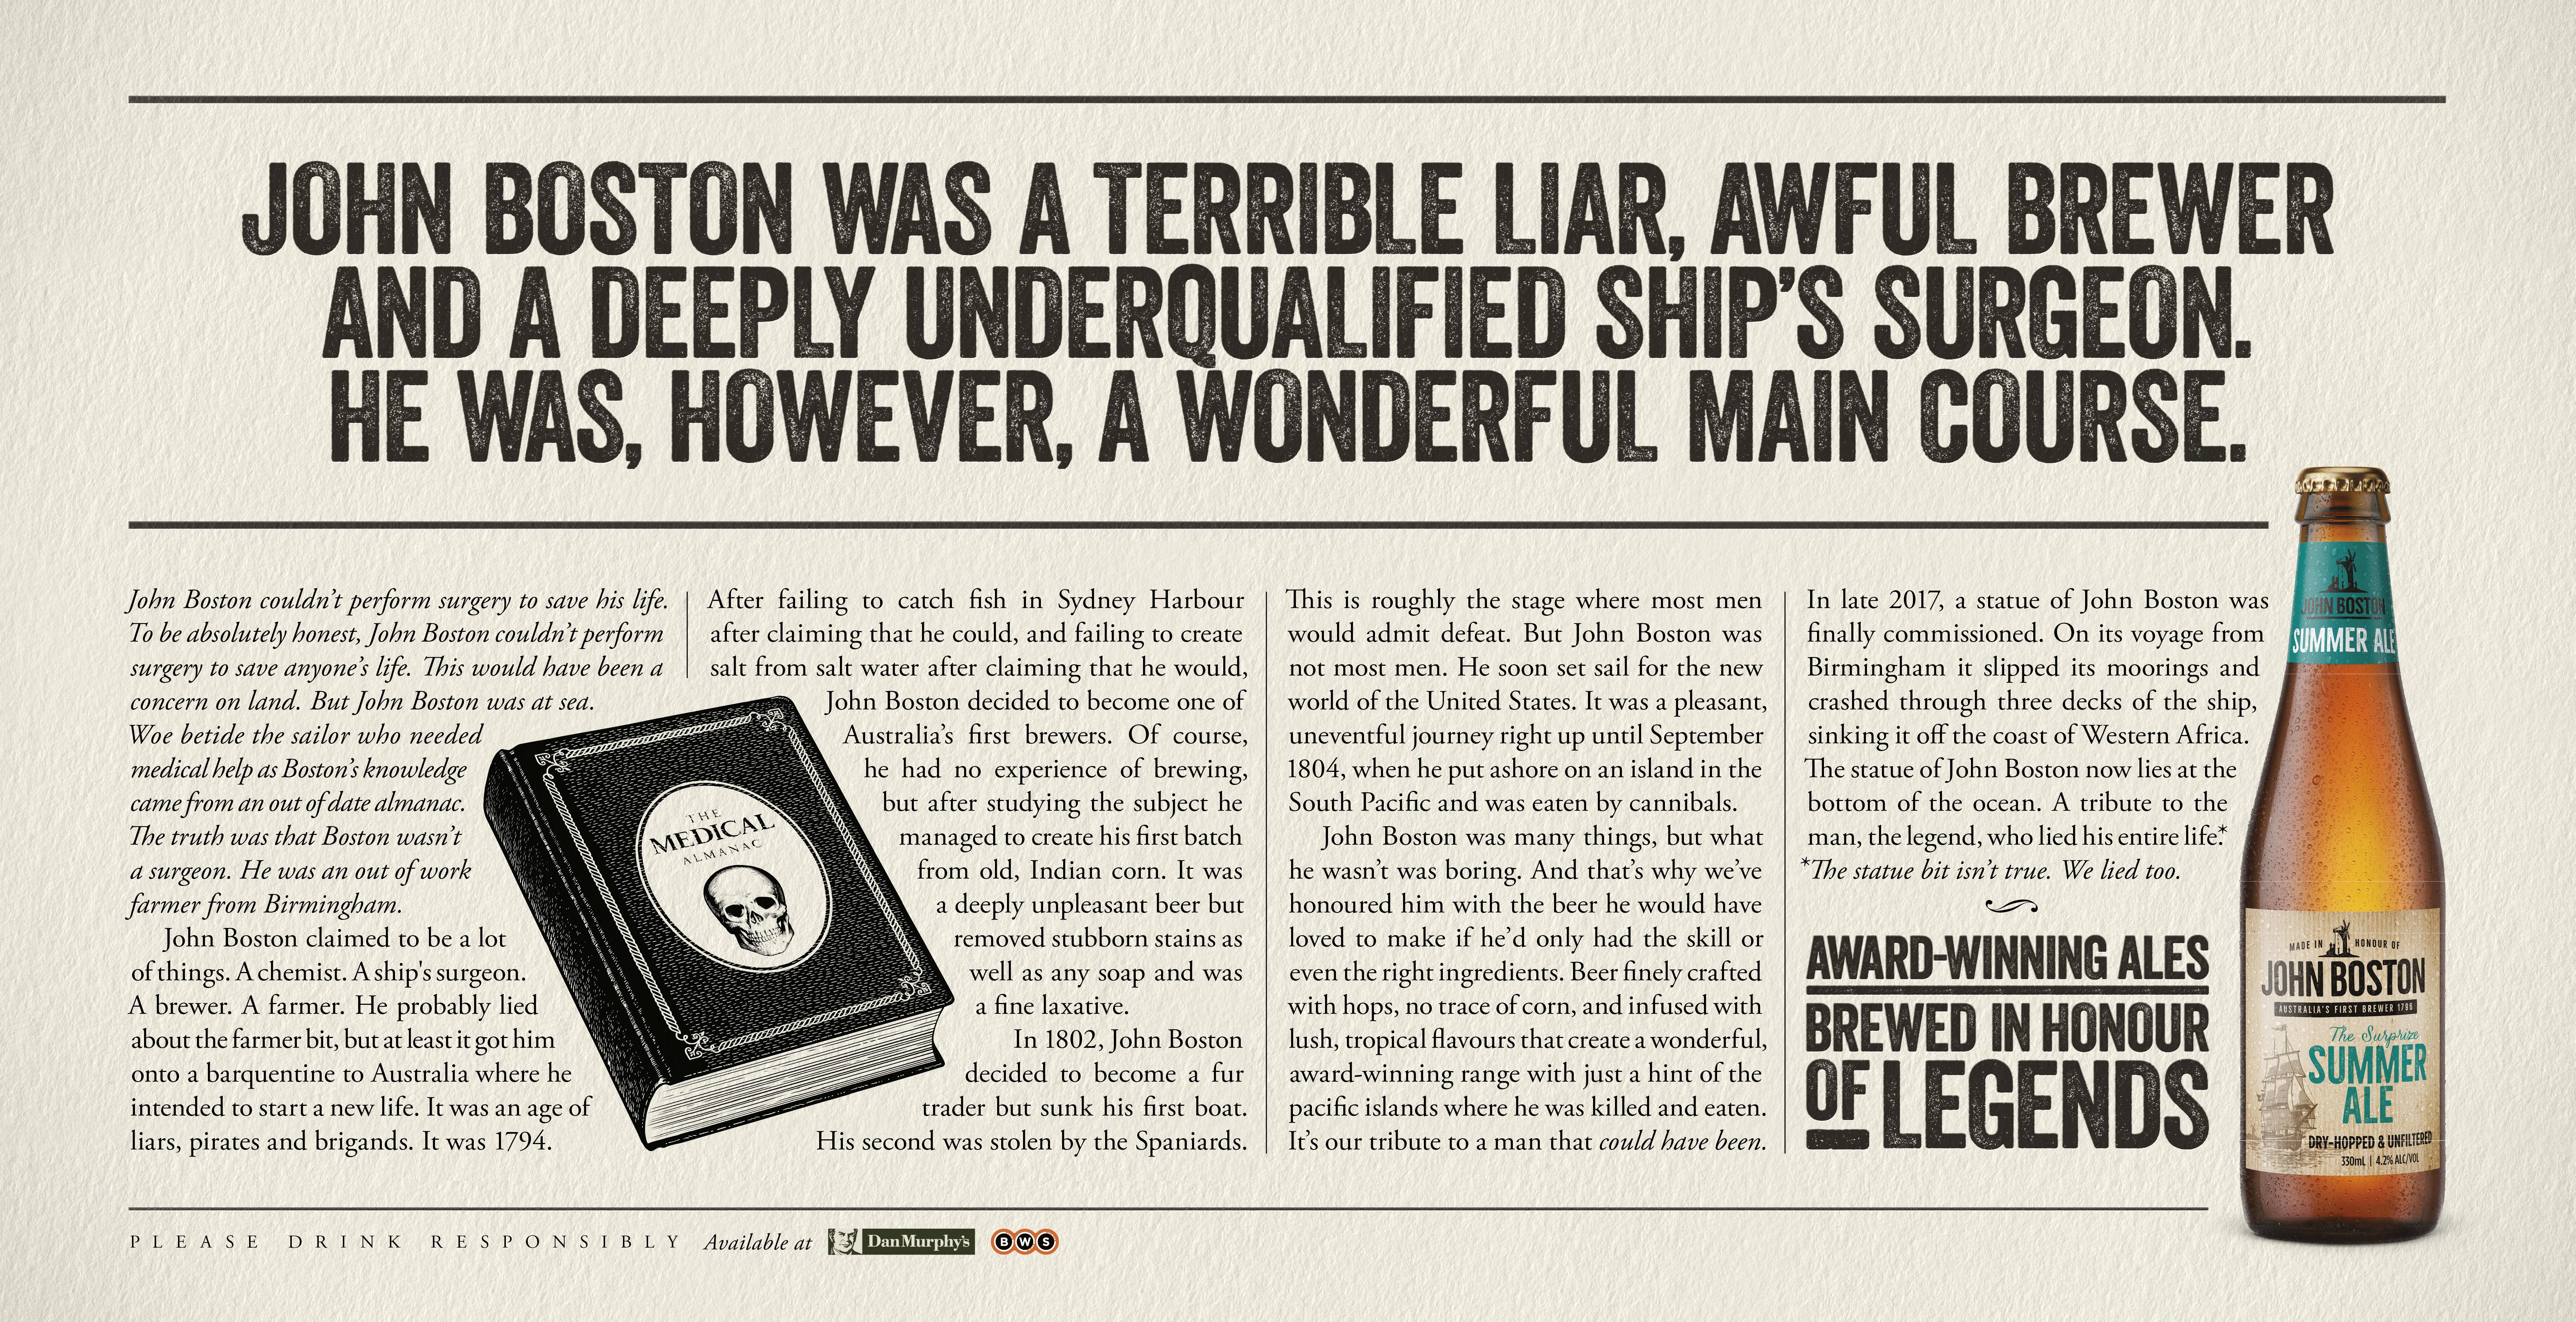 John Boston was a terrible liar... however, a wonderful main course.